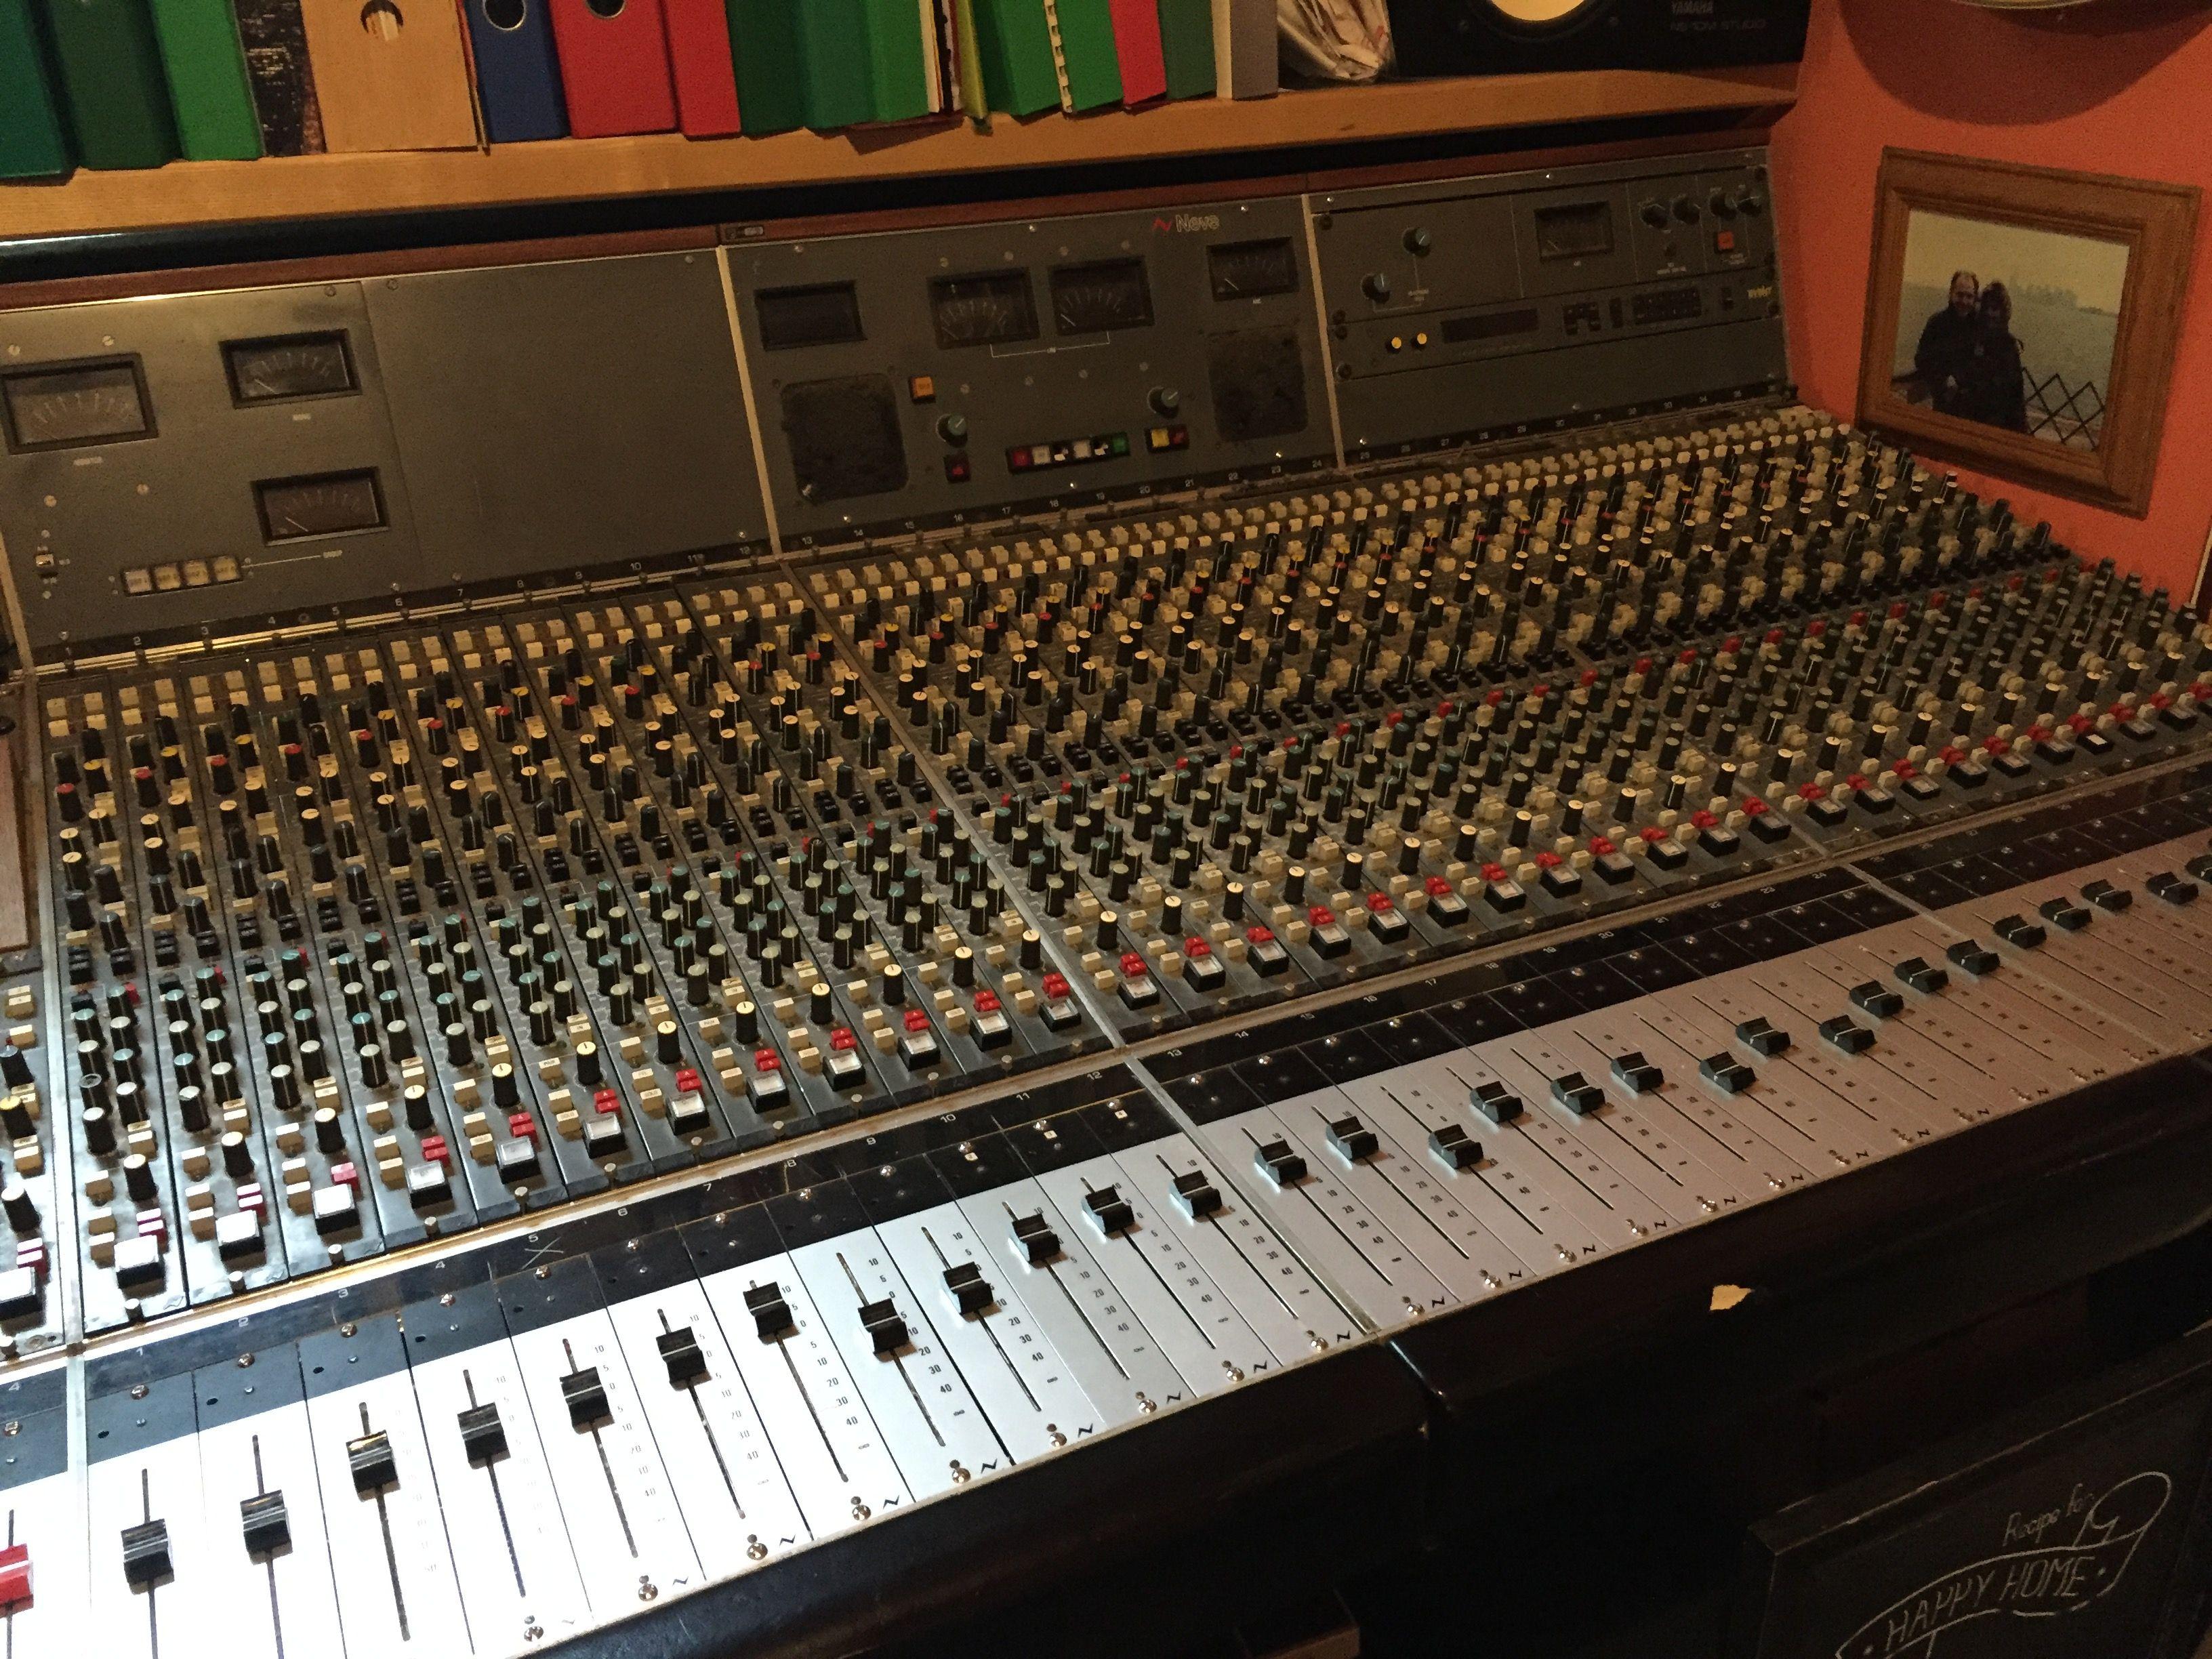 Pleasant Neve Desk Life In The Studio Music Music Instruments Audio Download Free Architecture Designs Scobabritishbridgeorg